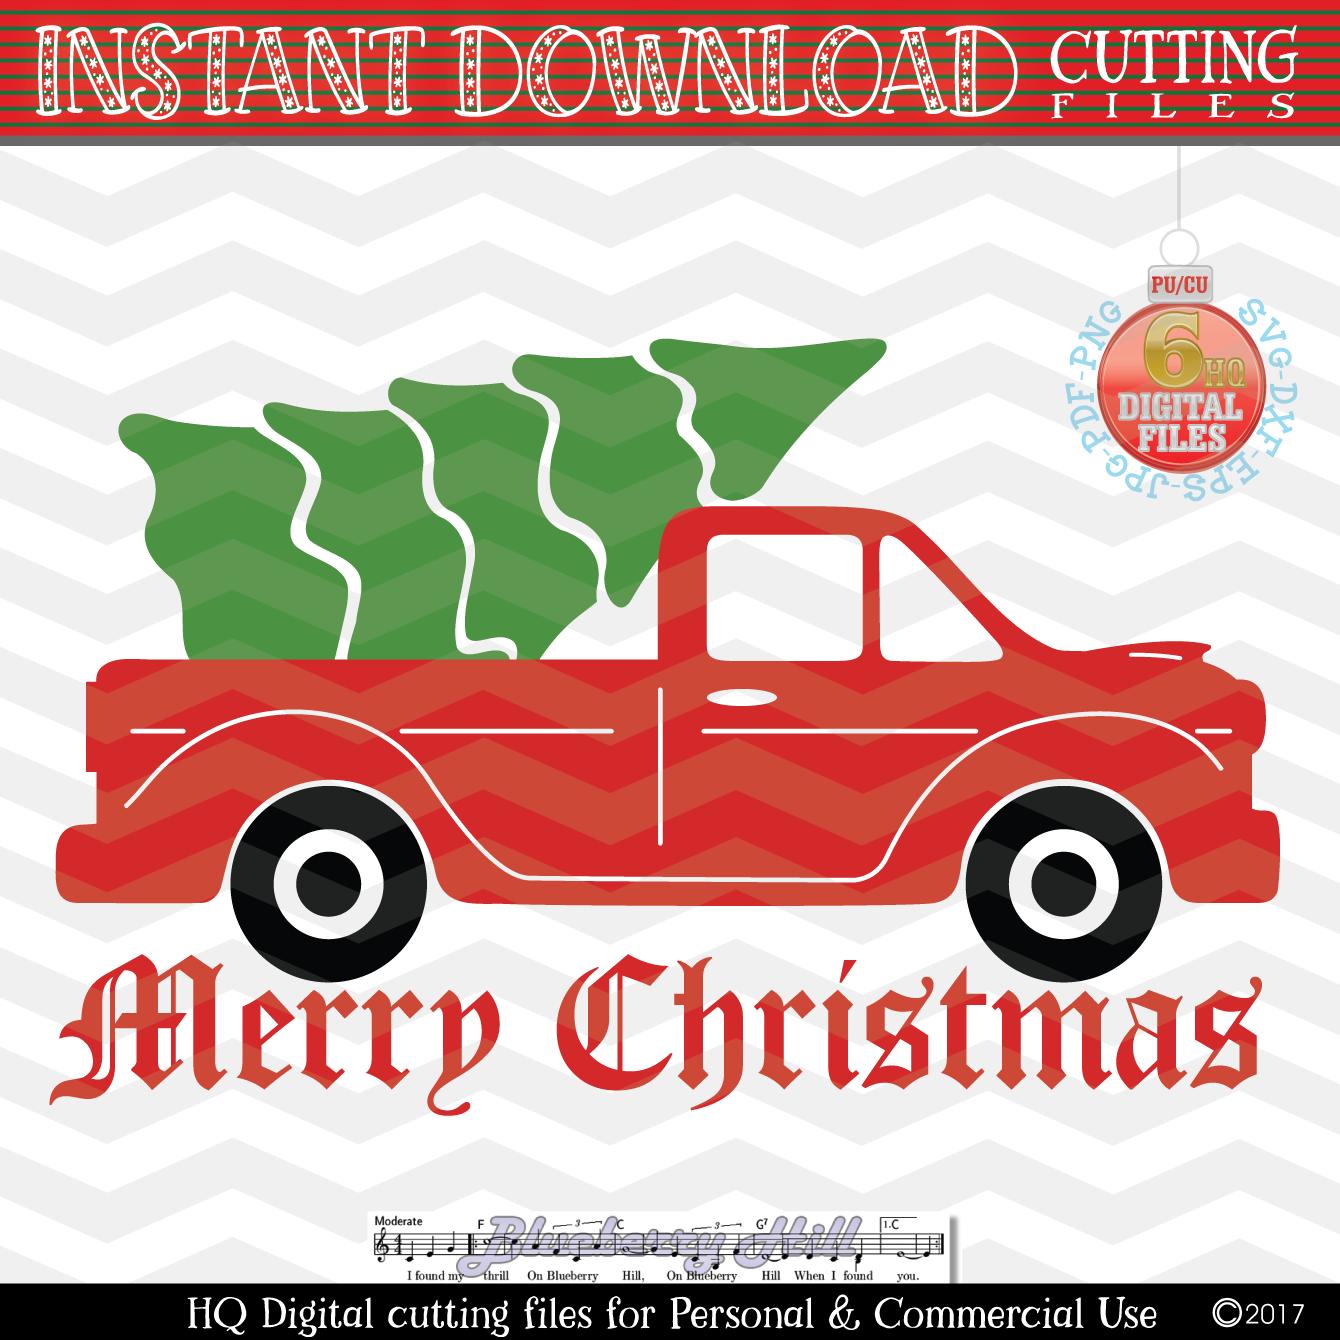 Christmas Tree Truck Svg Free.Christmas Truck Christmas Truck With Tree Svg Christmas